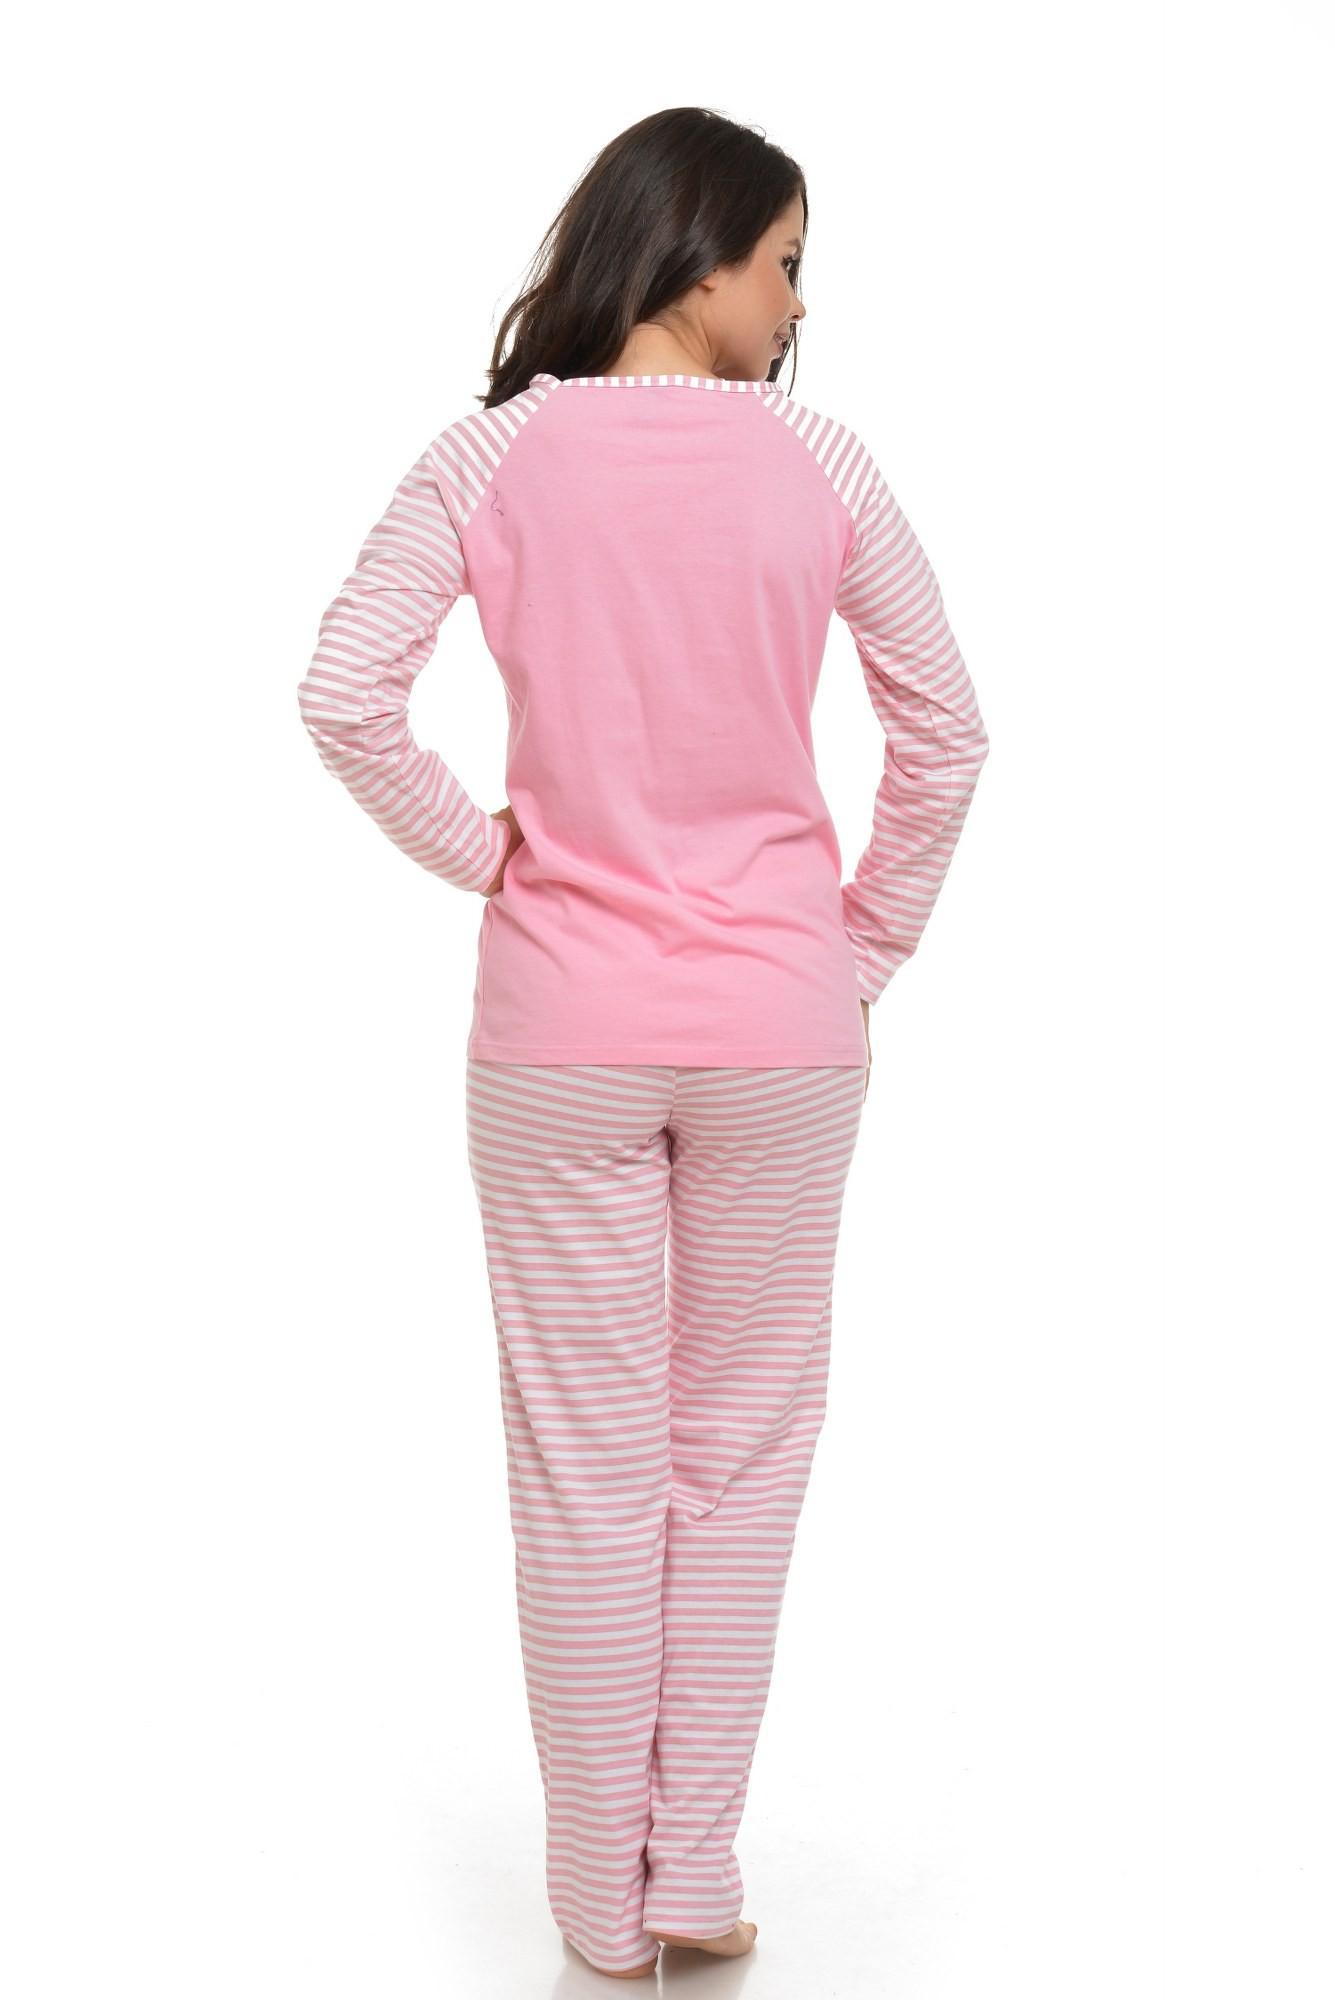 Pijama roz garden of joy cu dungi albe